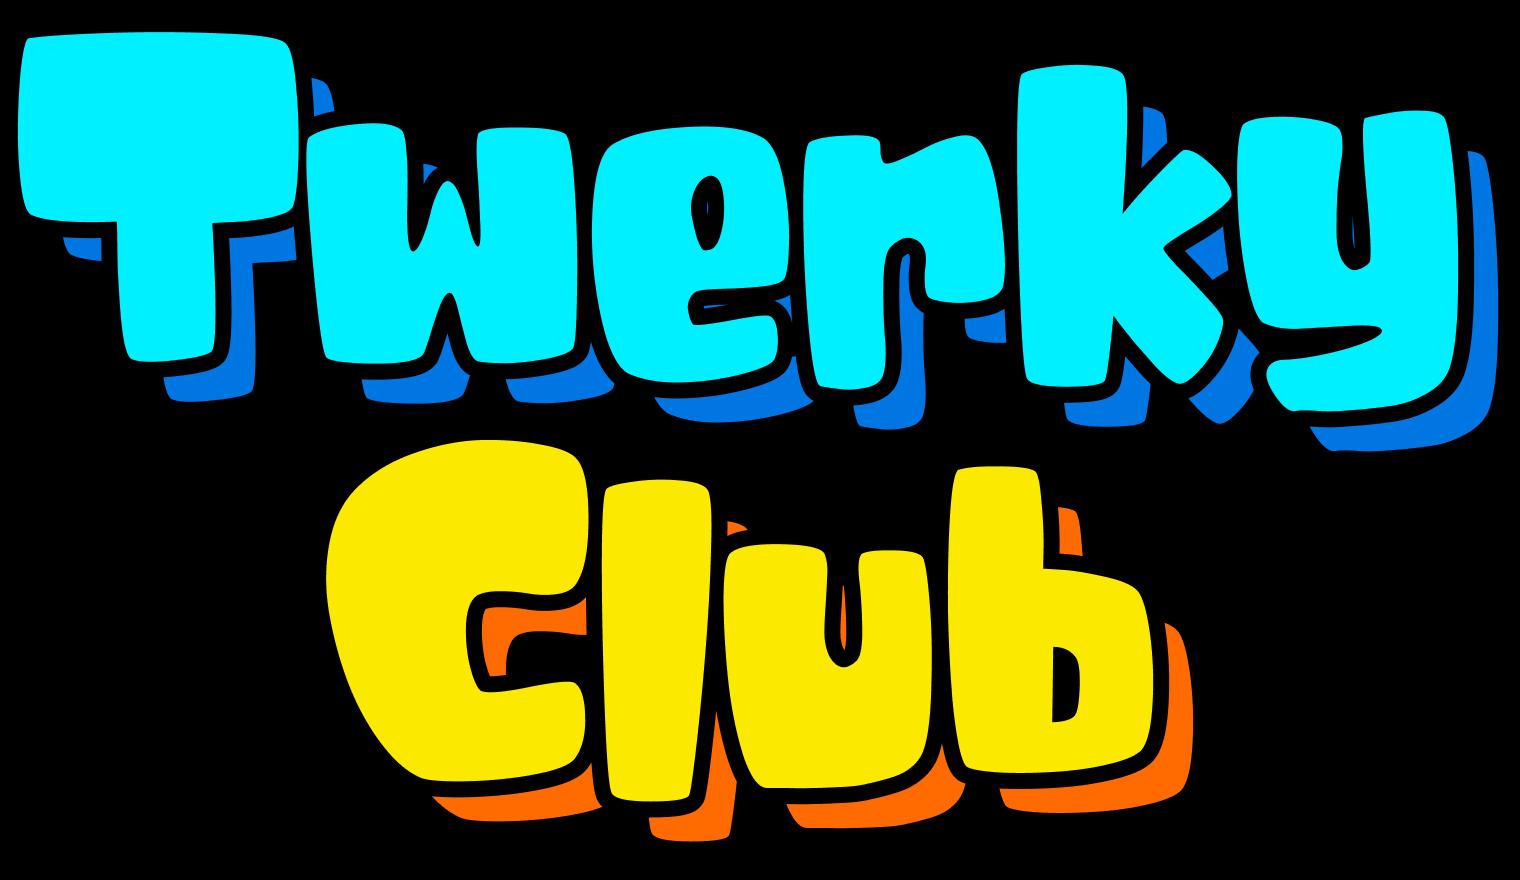 Twerky Club Logo